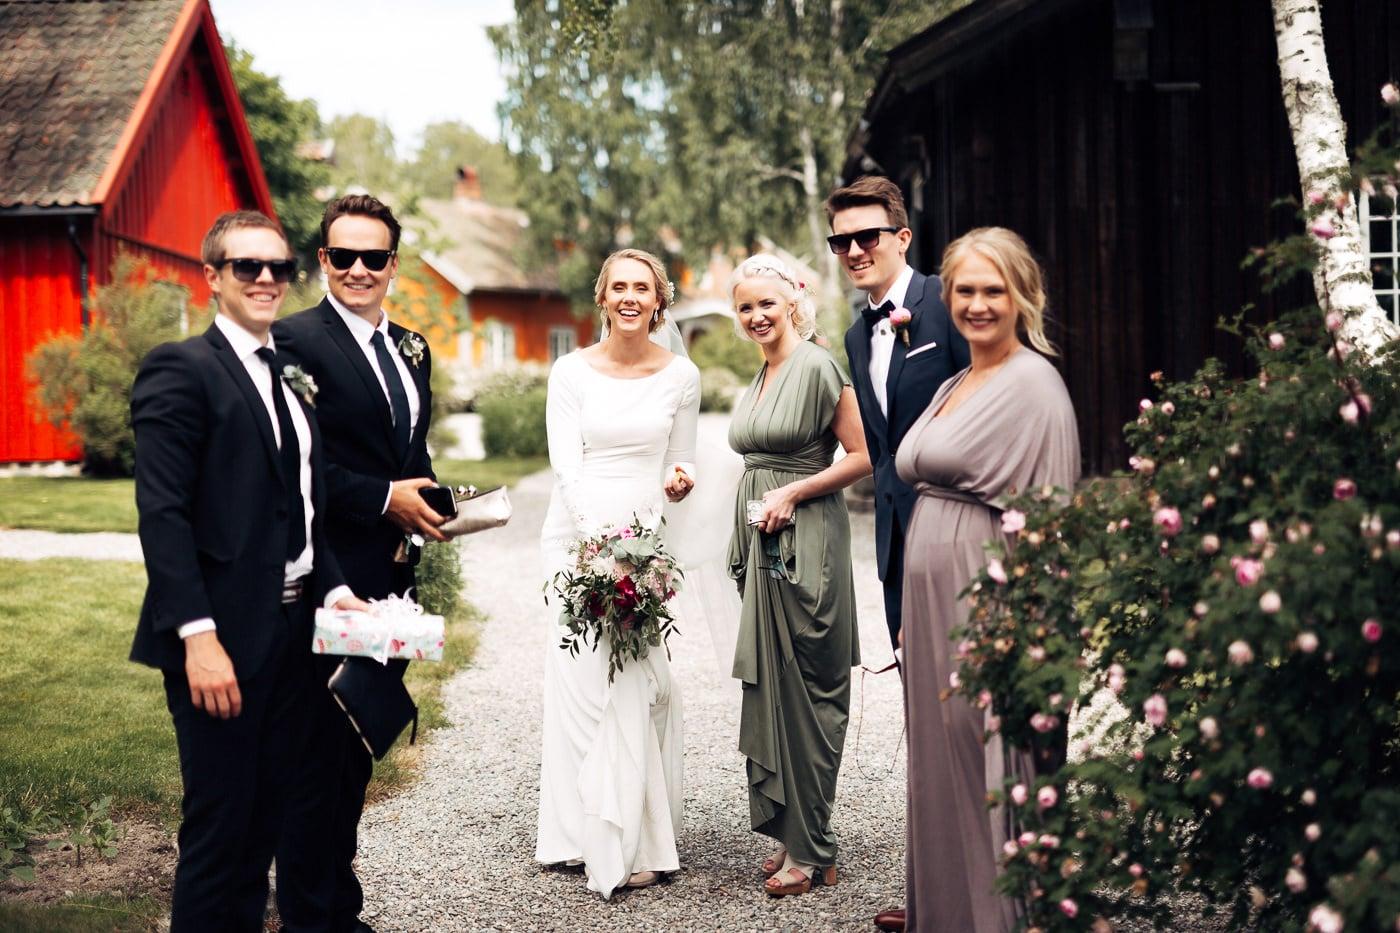 Karoline & Andreas - bryllup i Østfold med magiske detaljer Bryllup Fredrikstad Fotograf 42